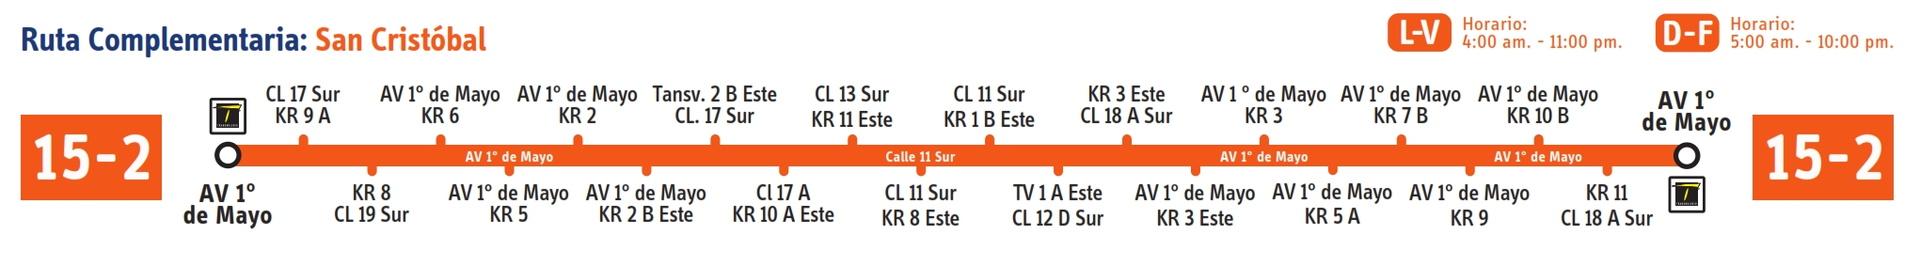 Ruta SITP: 15-2 San Cristóbal [Complementaria] 3